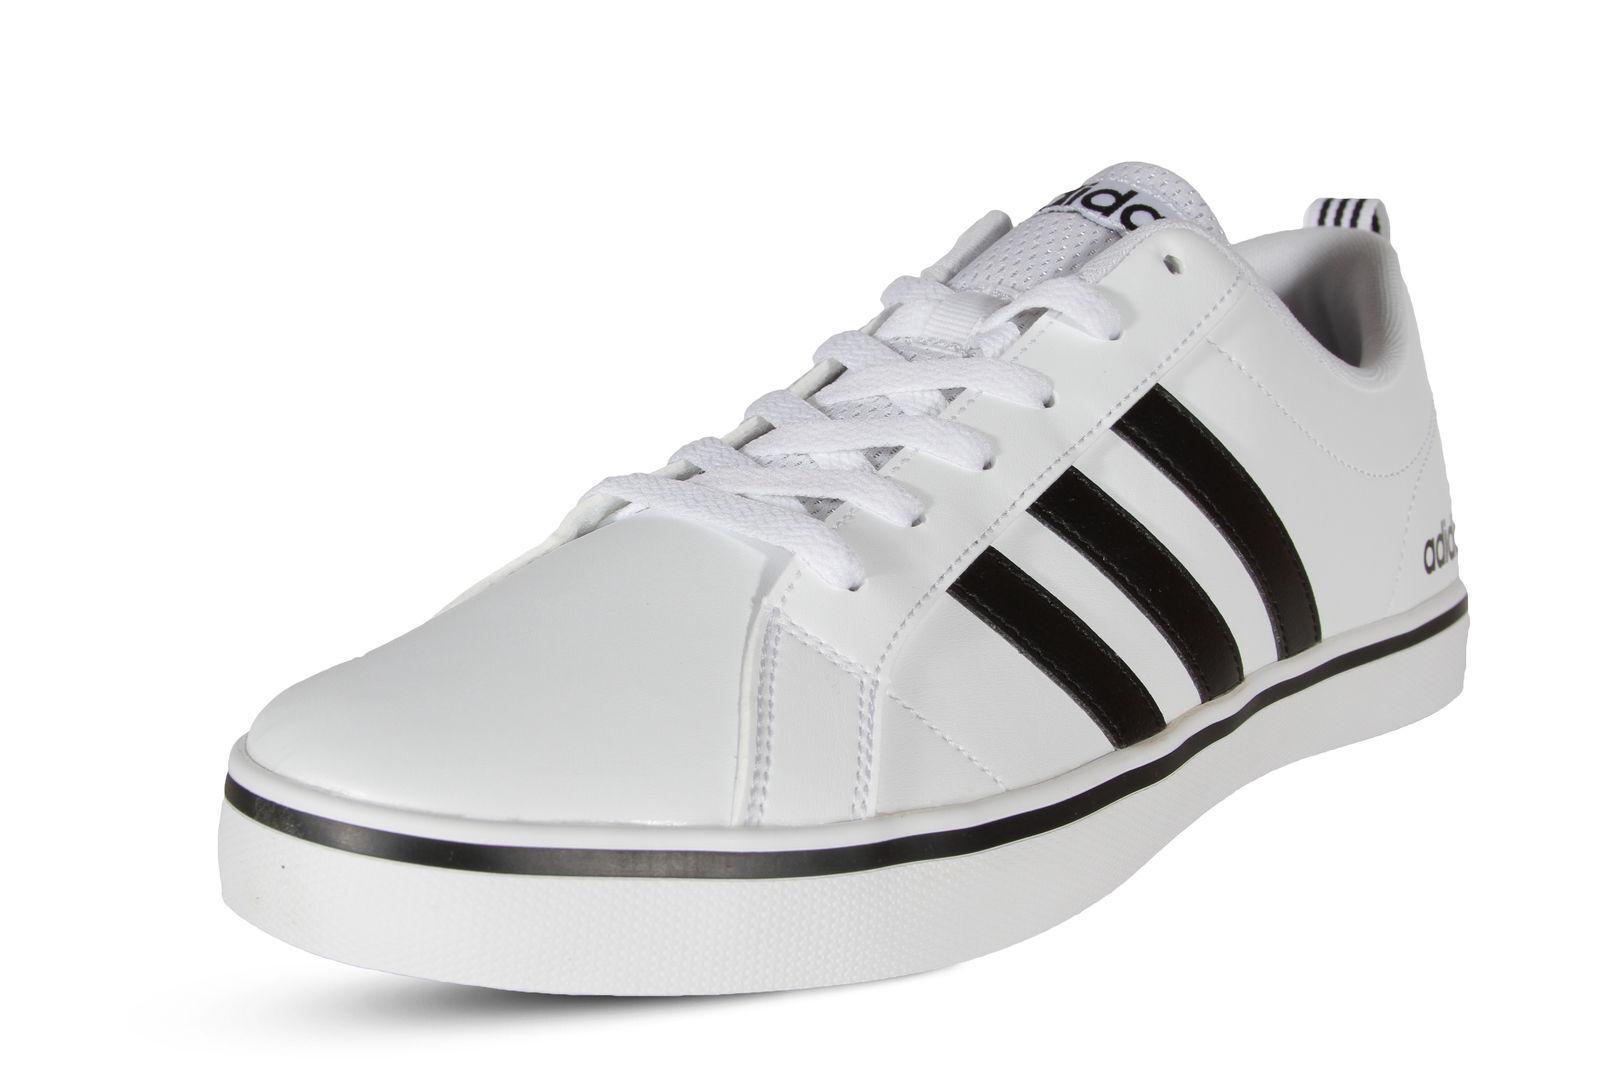 Adidas Performance Men's Pace Vs-M Fashion Sneaker